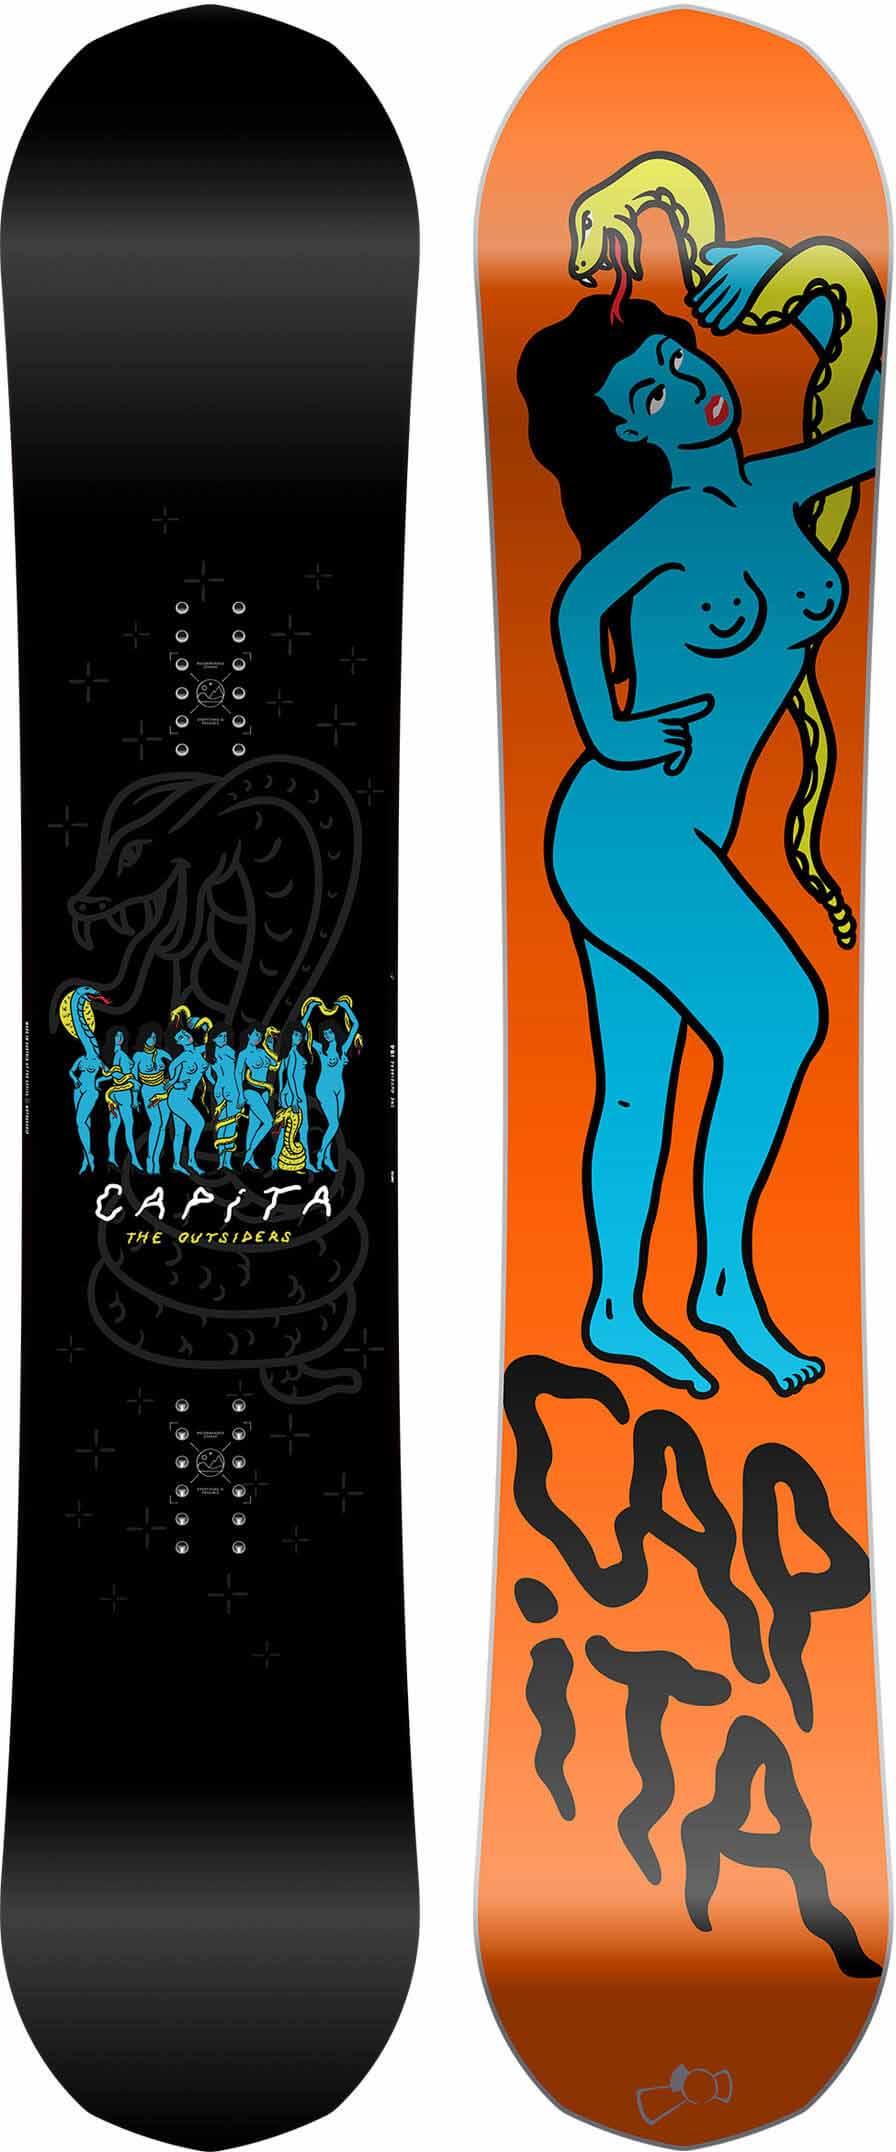 image capita-outsiders-154-jpg